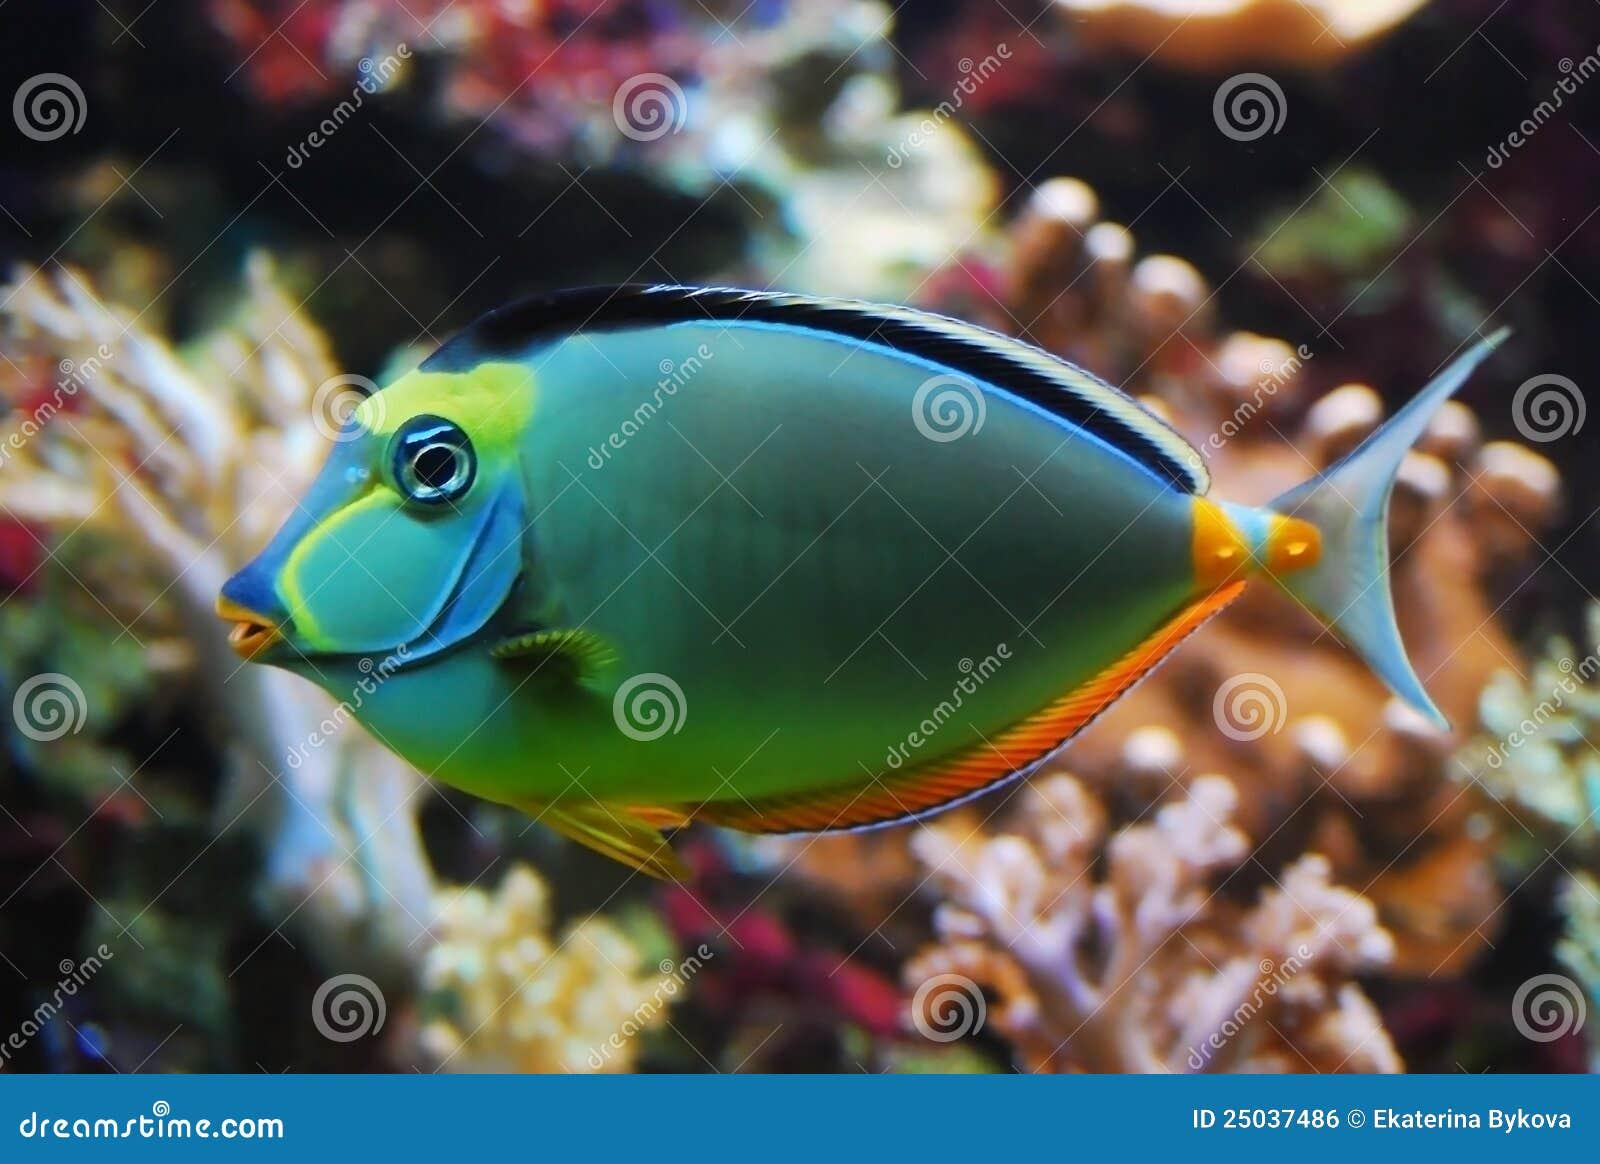 Colorful fish closeup stock photo. Image of plant, closeup - 25037486